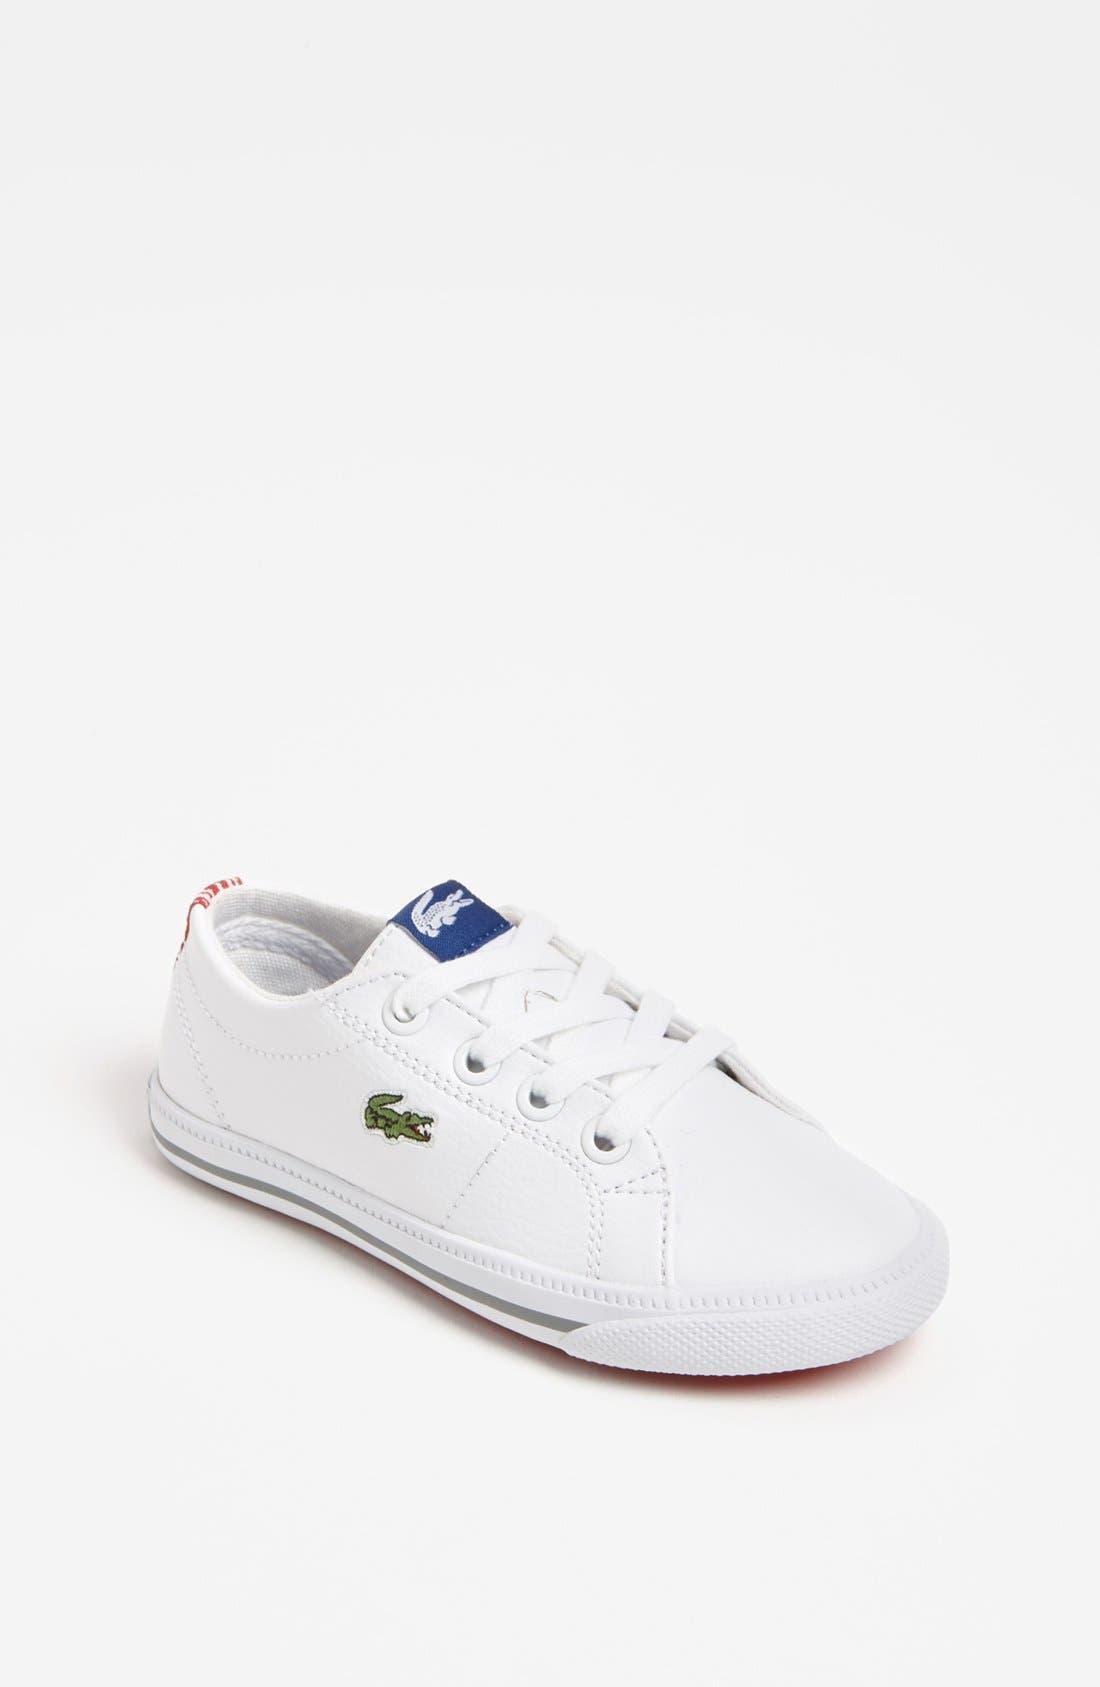 Alternate Image 1 Selected - Lacoste 'Marcel' Sneaker (Toddler)